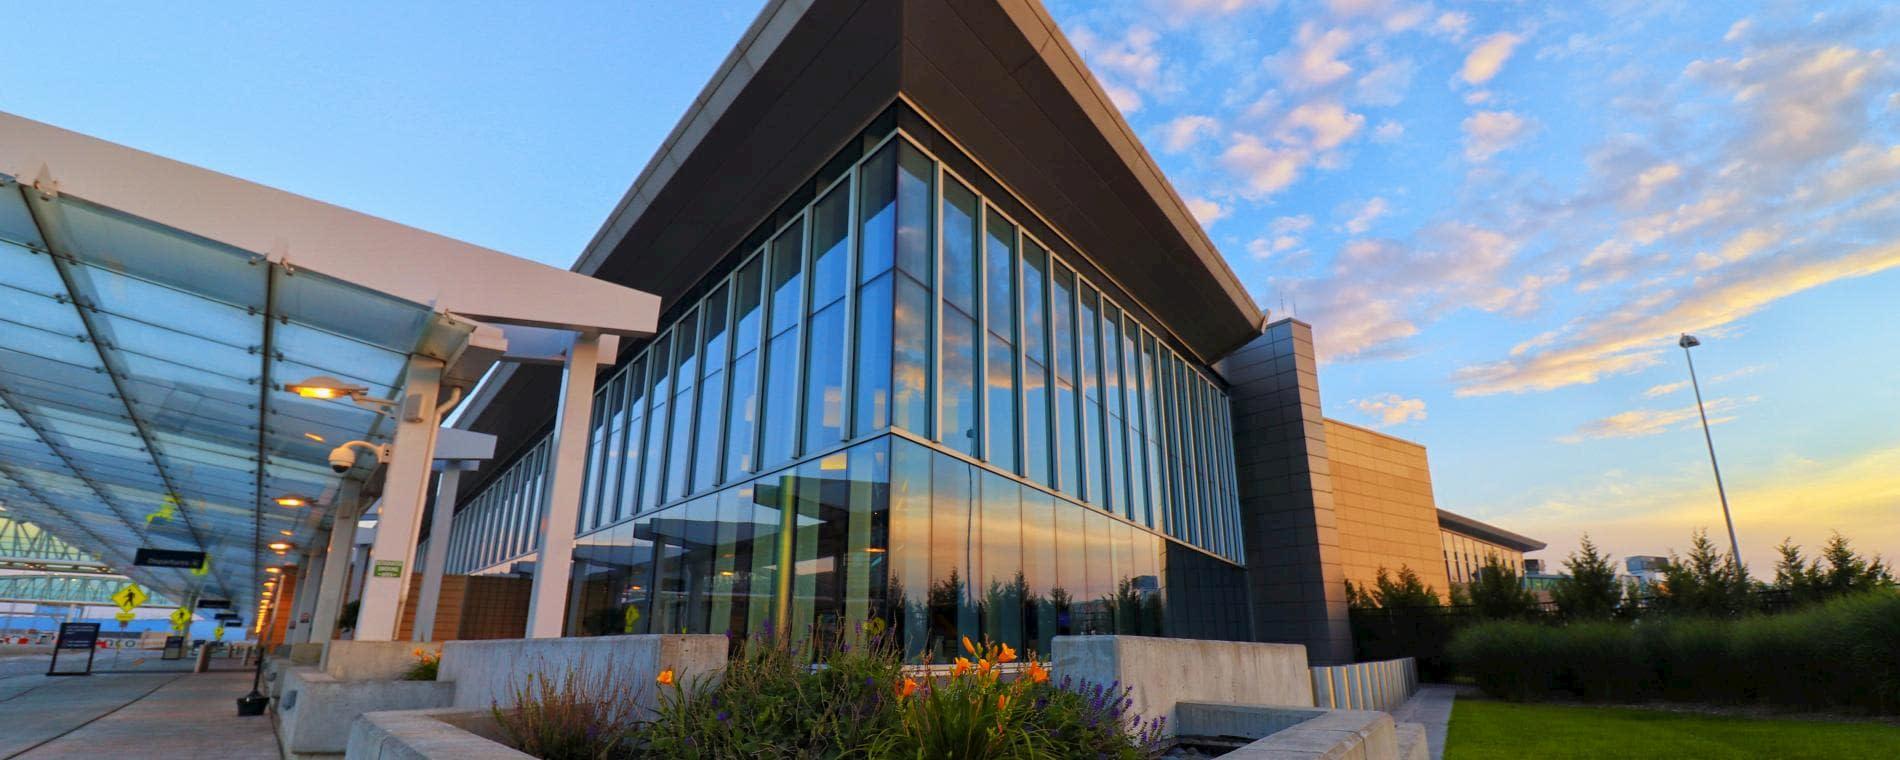 Wichita Airport - Dwight D. Eisenhower National Airport